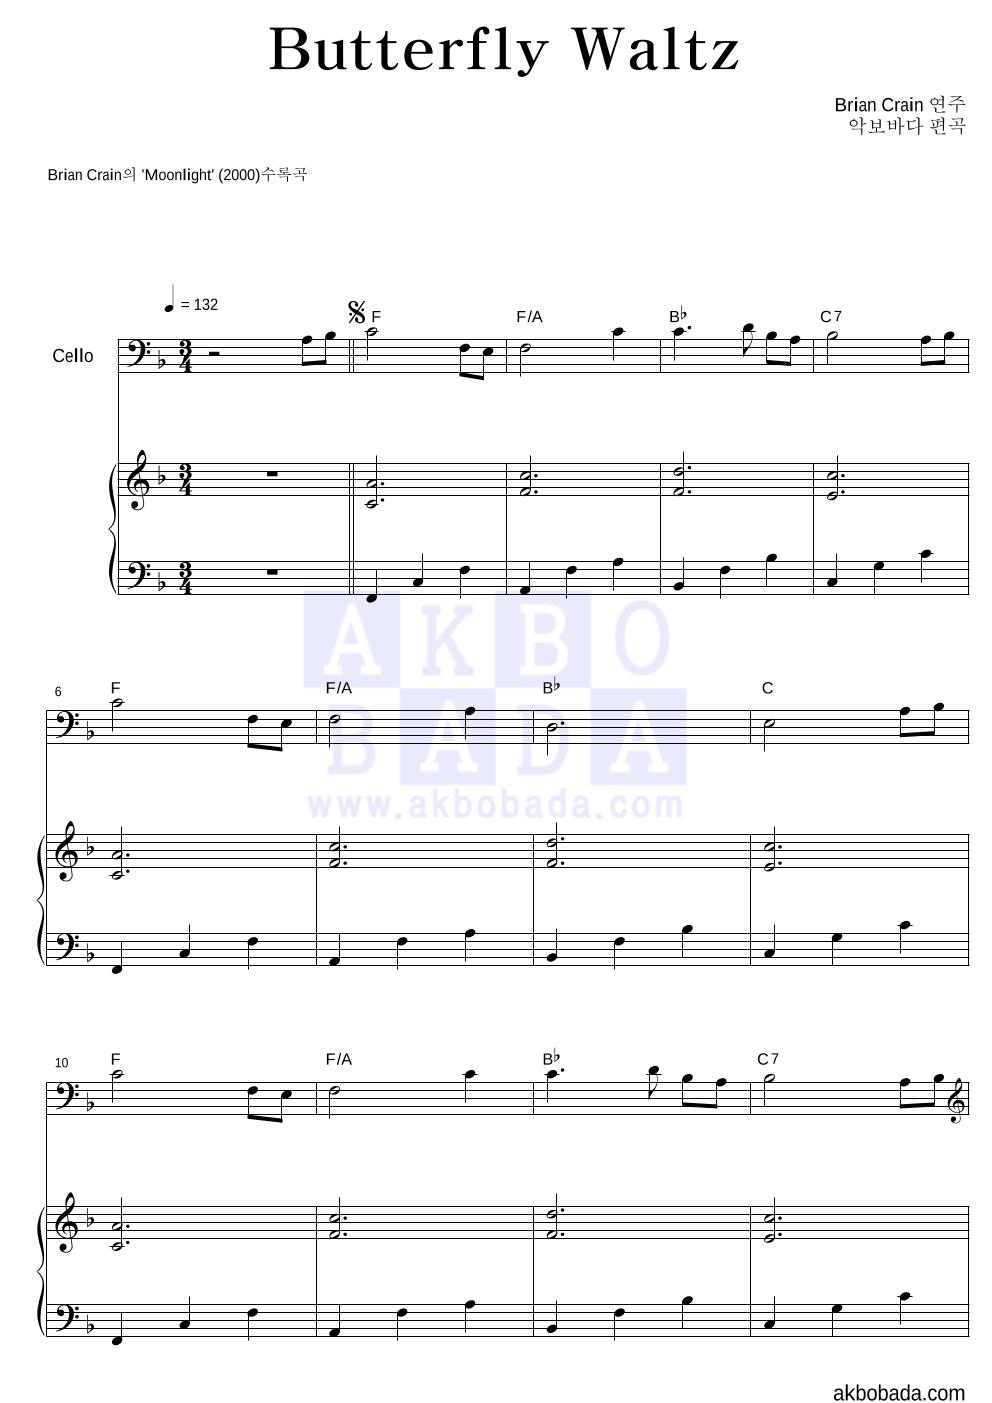 Brian Crain - Butterfly Waltz 첼로&피아노 악보